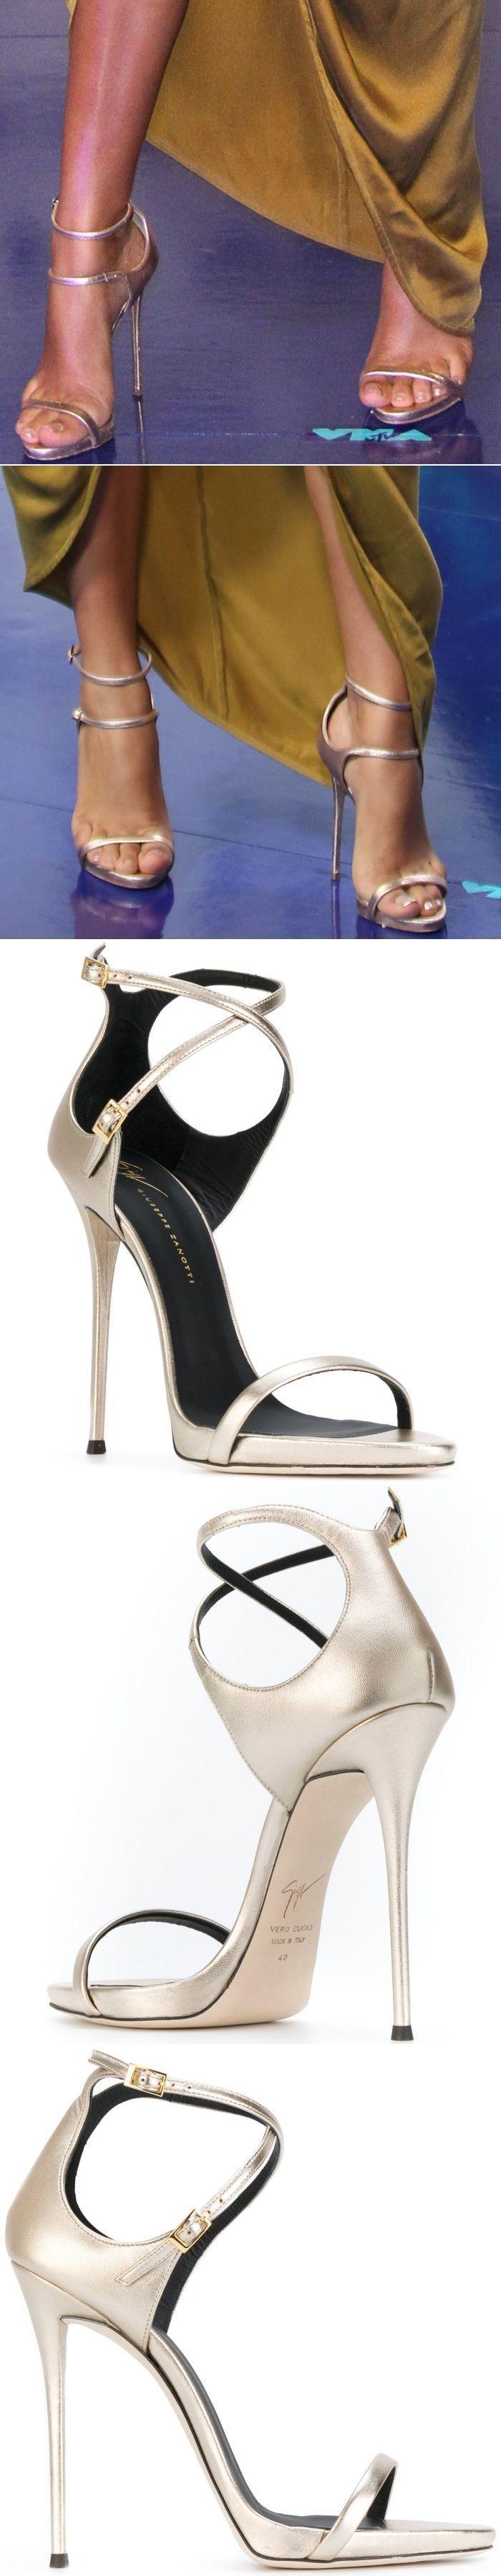 "Cick to see how Yara Shahidi styled her Giuseppe Zanotti ""Darcie"" sandals #giuseppezanottiheelswedding #giuseppezanottiheelssandals"